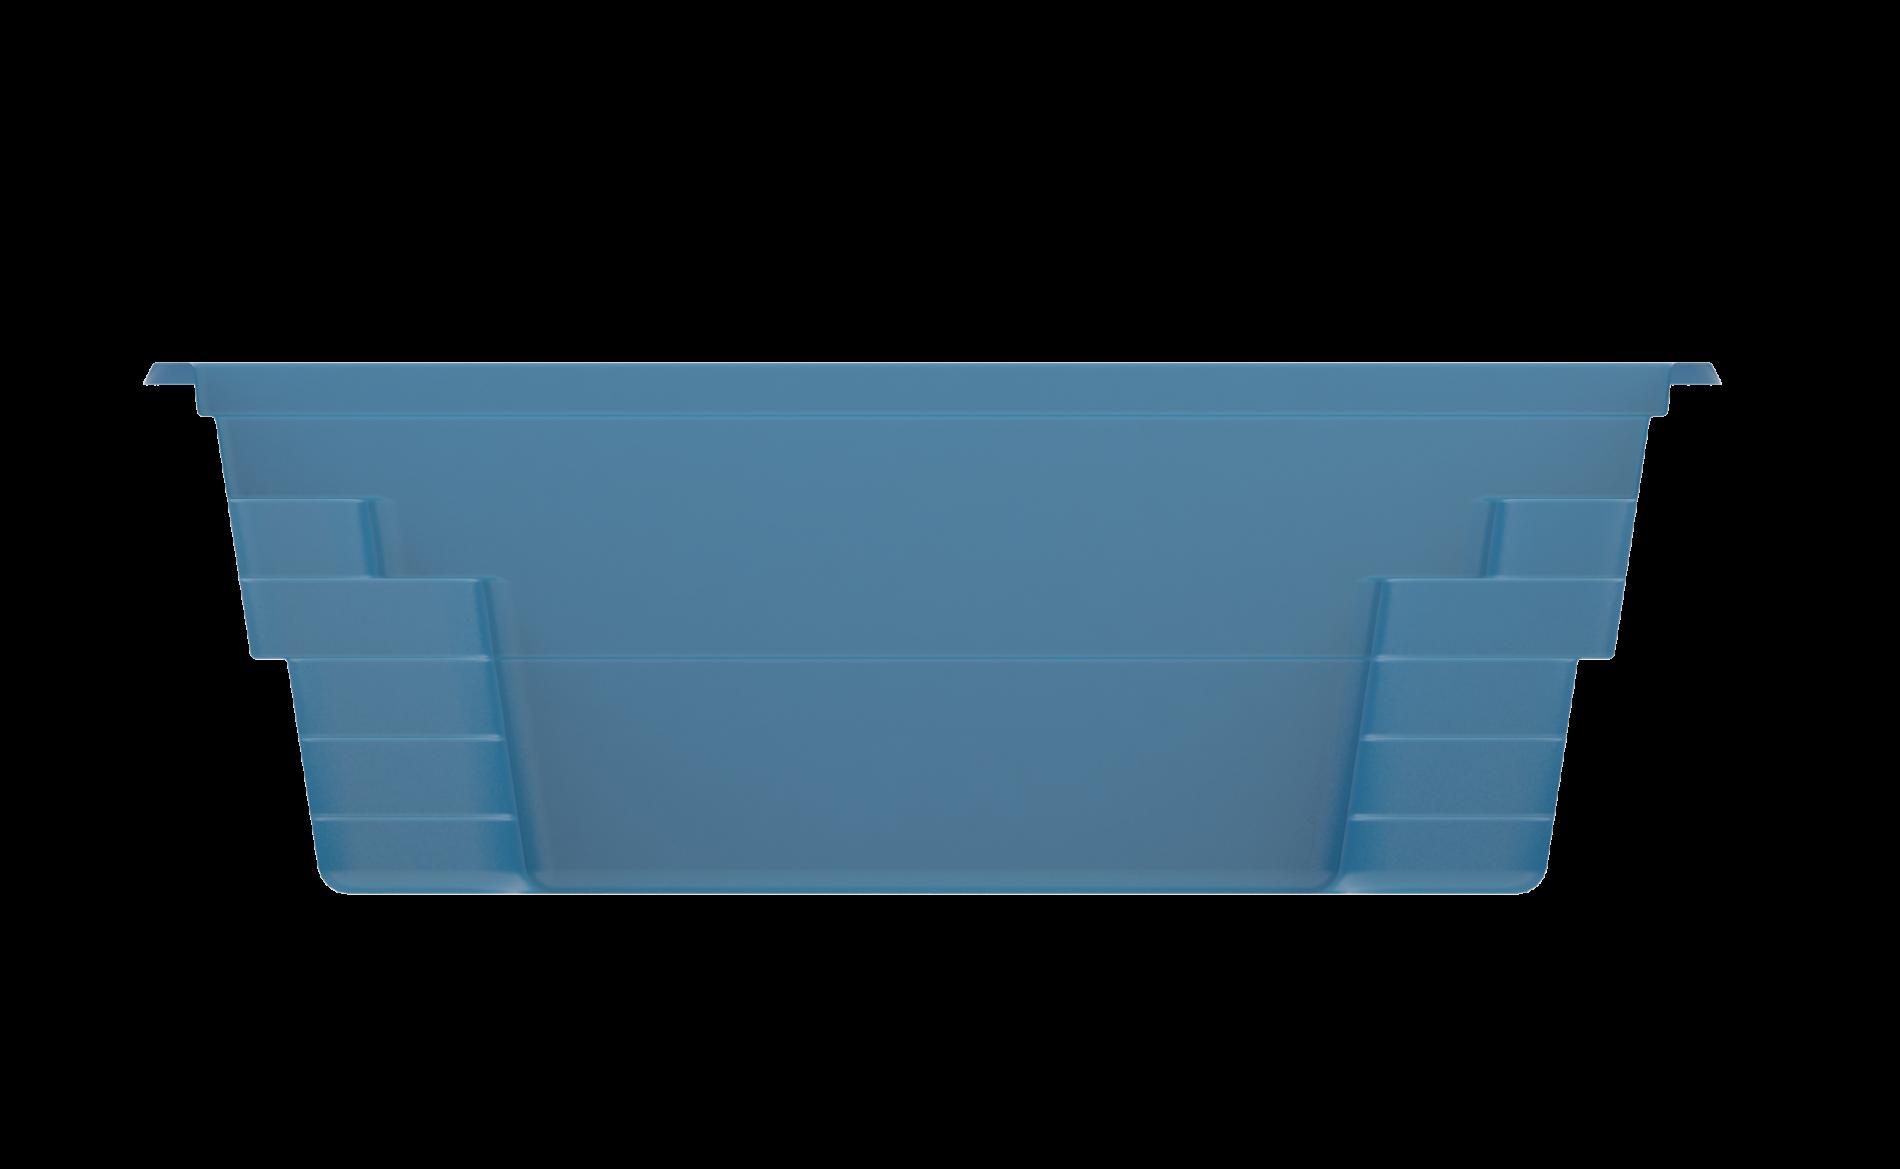 4507b39a1432553457 Fb Xl Png: Trainer, Lång Pool Med Integrerad Trappa